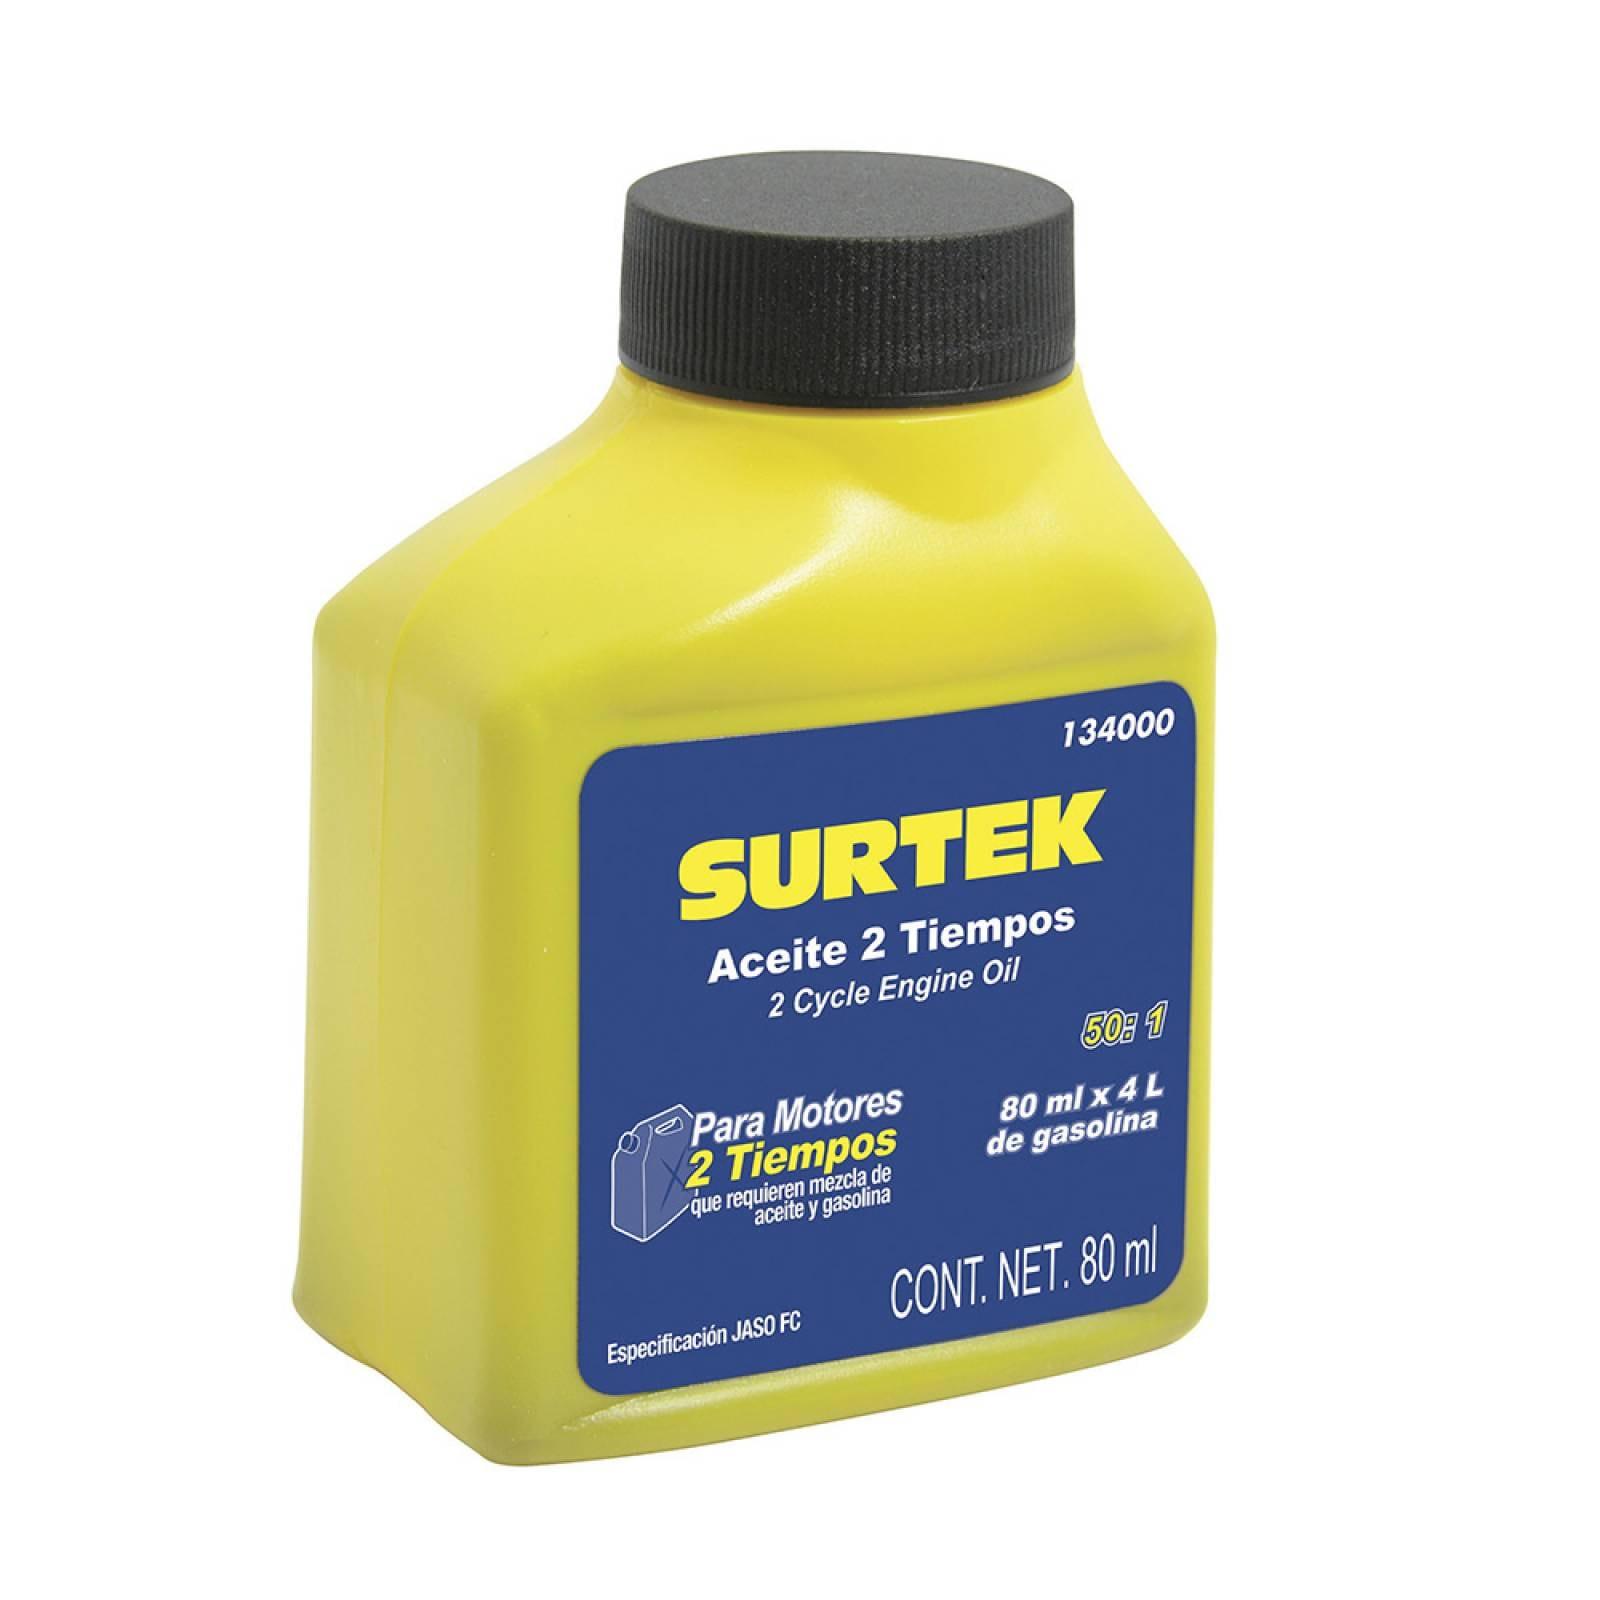 Aceite 2 tiempos 80 ml  134000 Surtek